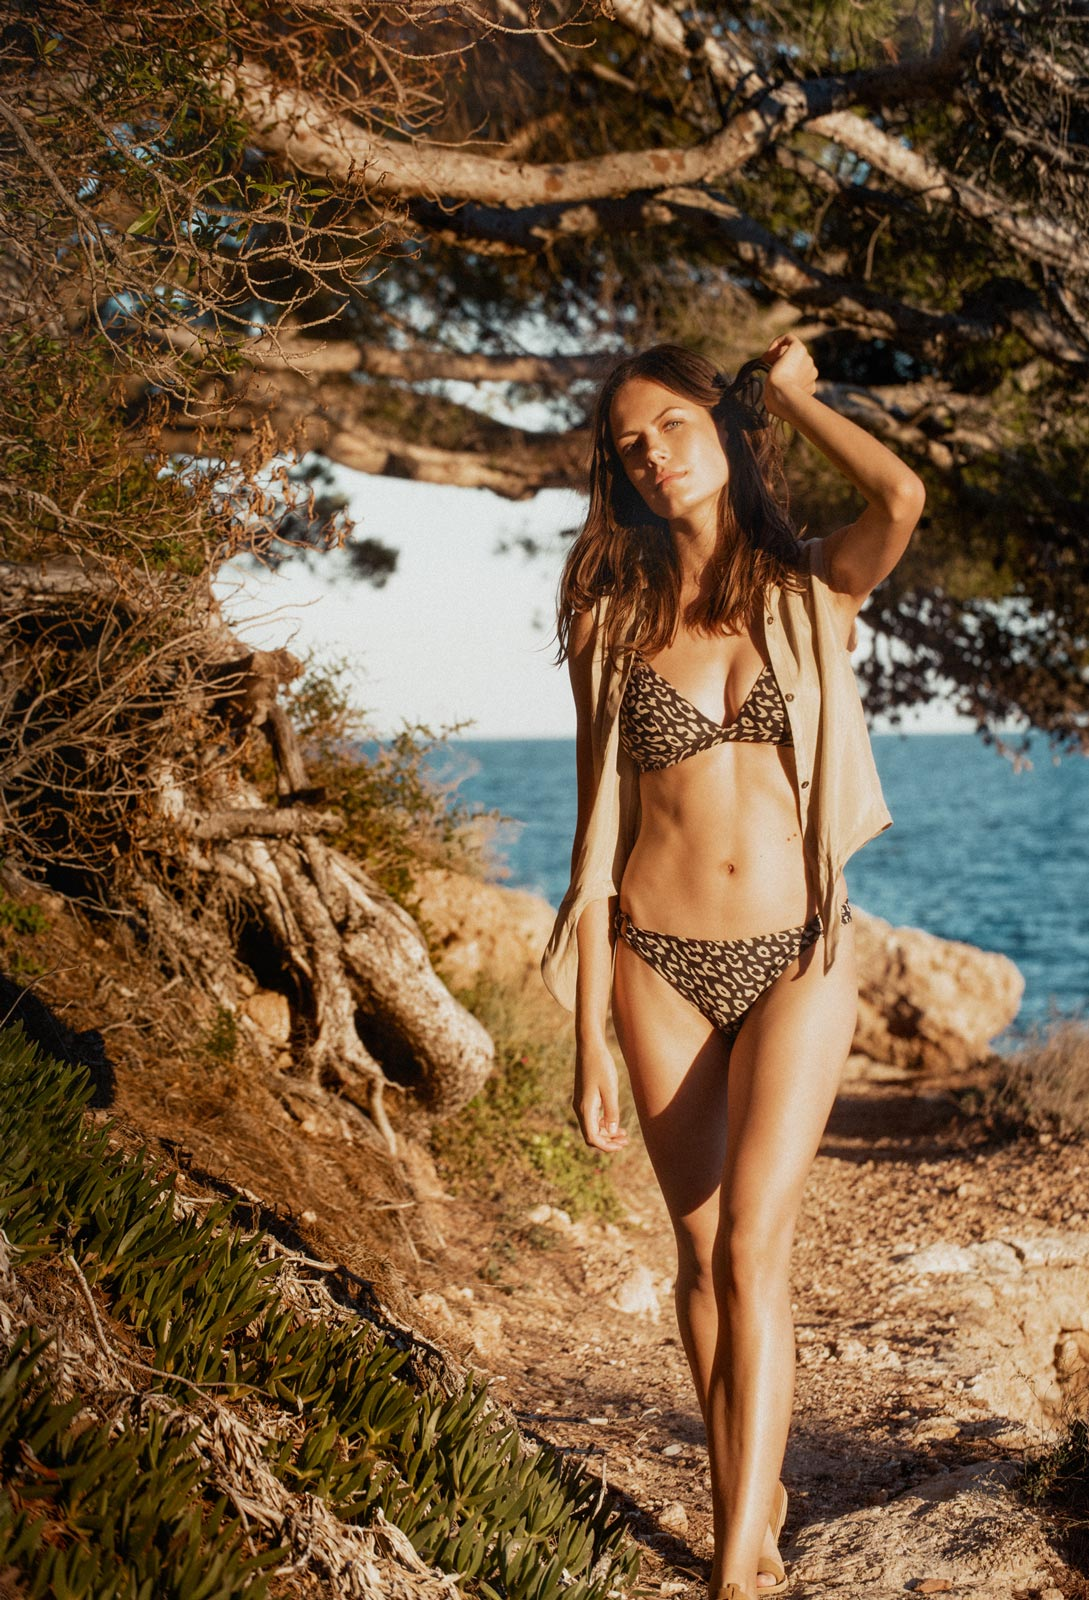 Songo shirt Nude Bawe bikini Leopard by RESET PRIORITY